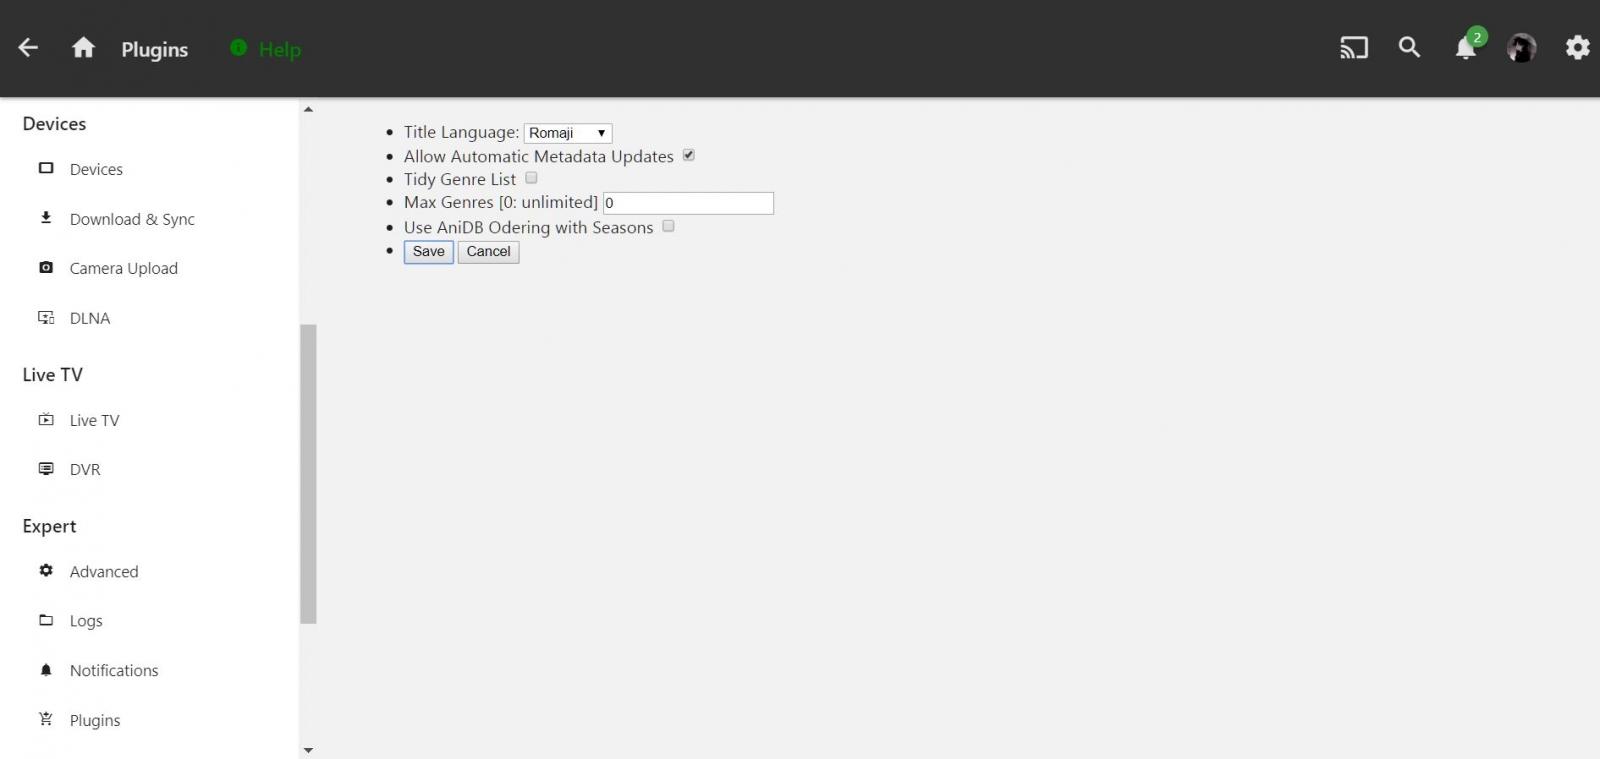 Anime Plugin anidb no metadata on episodes - Plugins - Emby Community